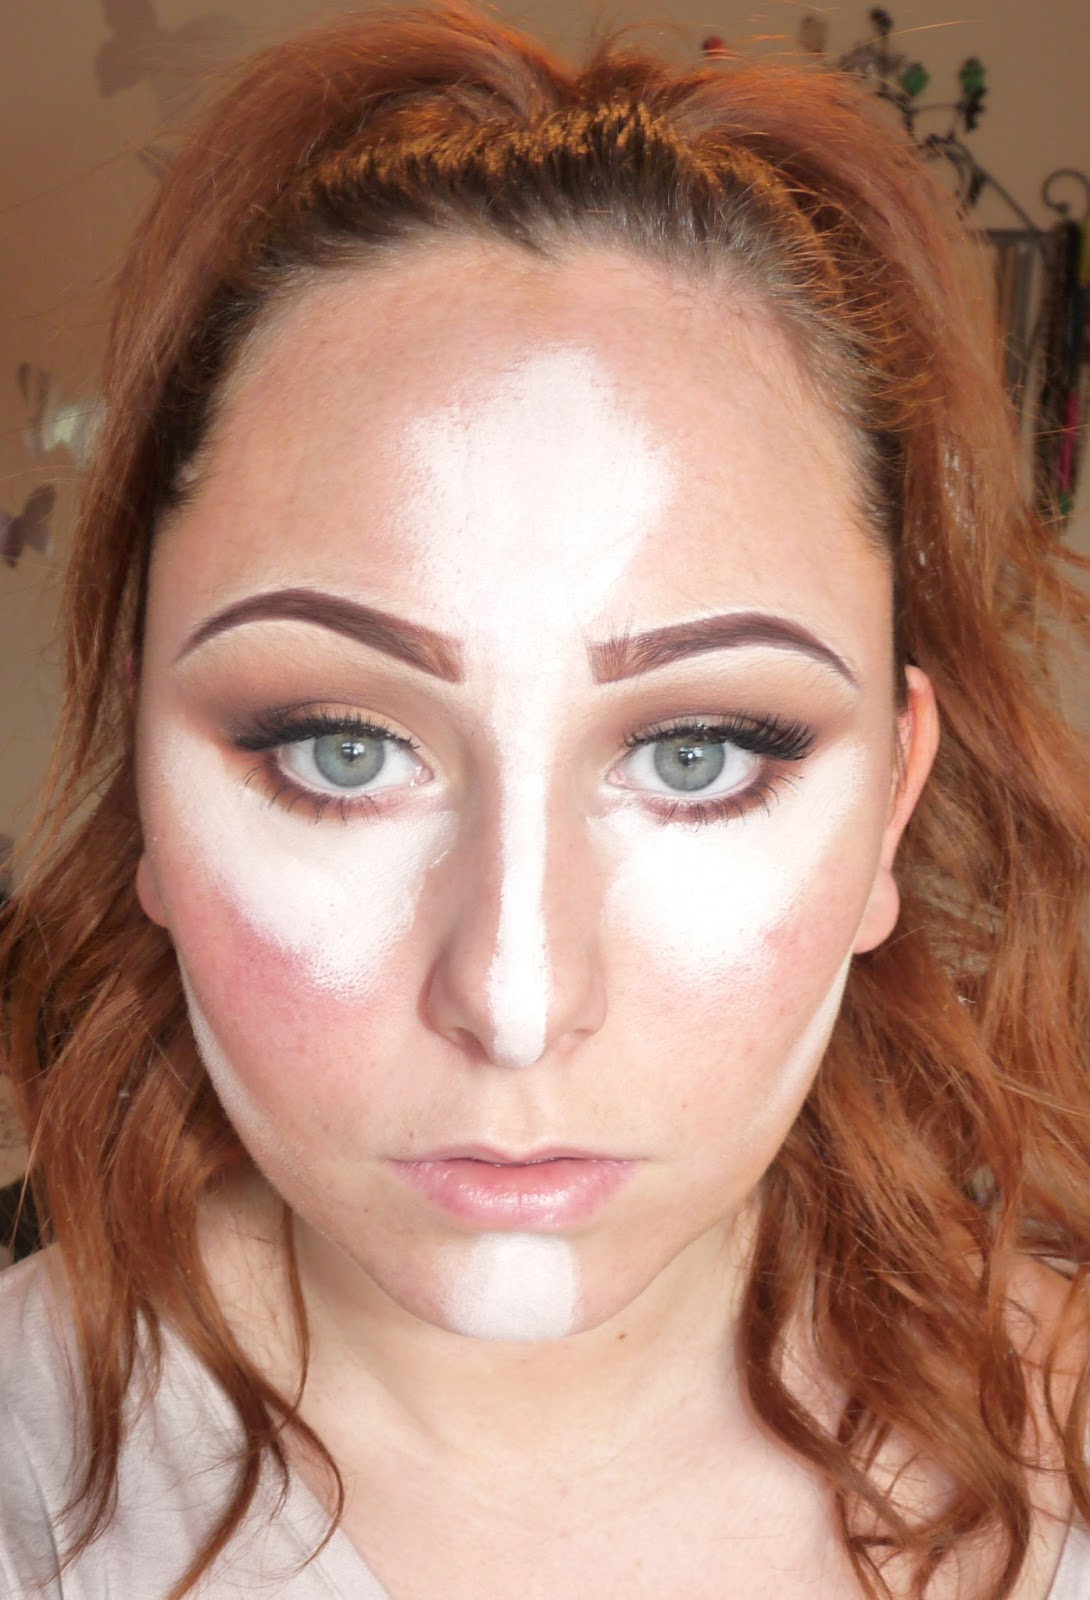 Kim Kardashian Make-up | Suzy Clarke Make-up Artist